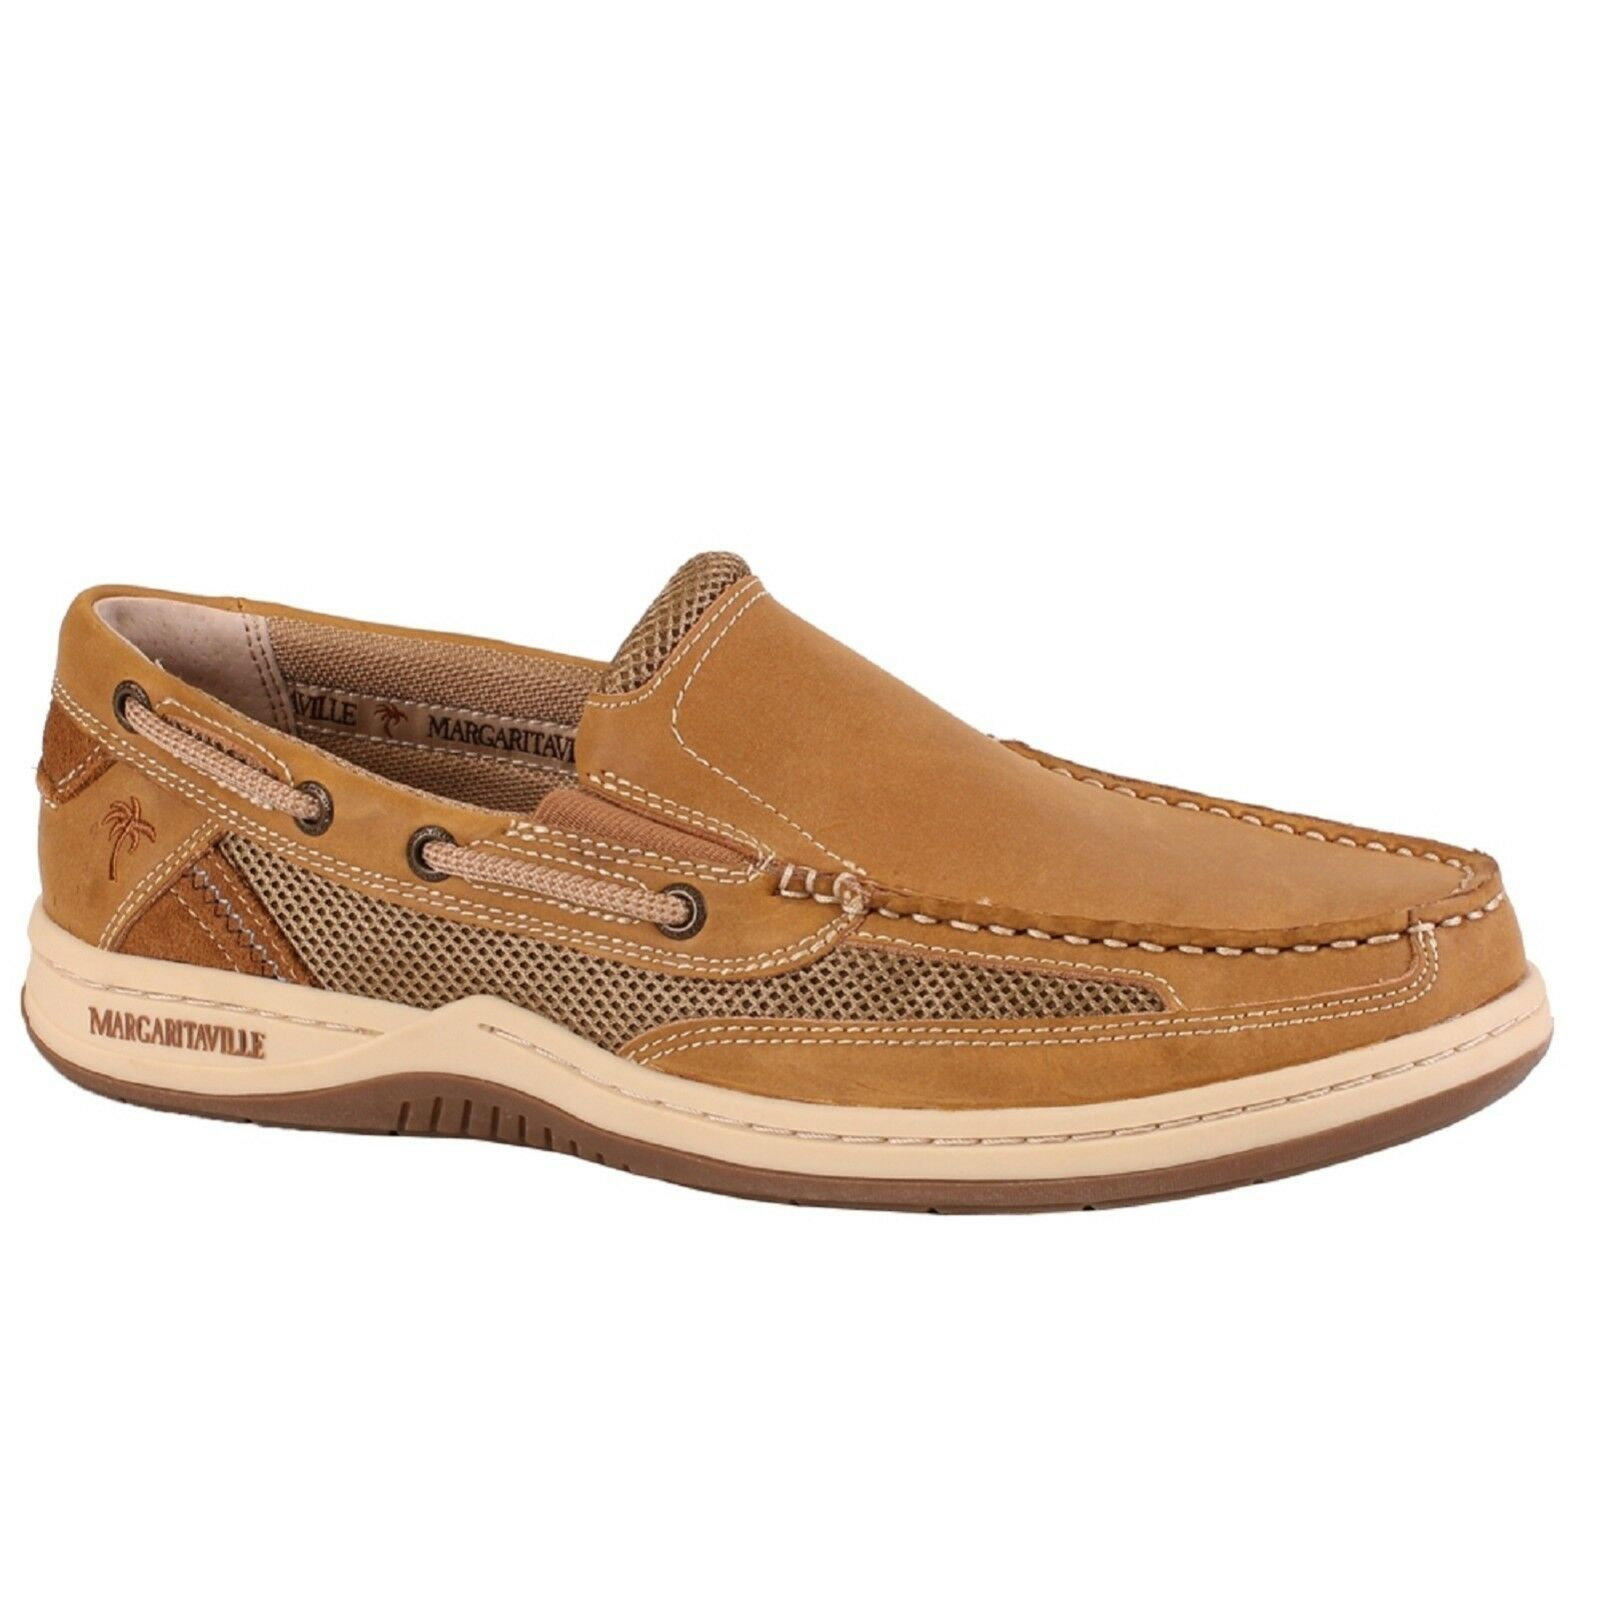 Men MARGARITAVILLE ANCHOR SO WIDE MFM181206 TAN Slip-On Oxford Boat shoes